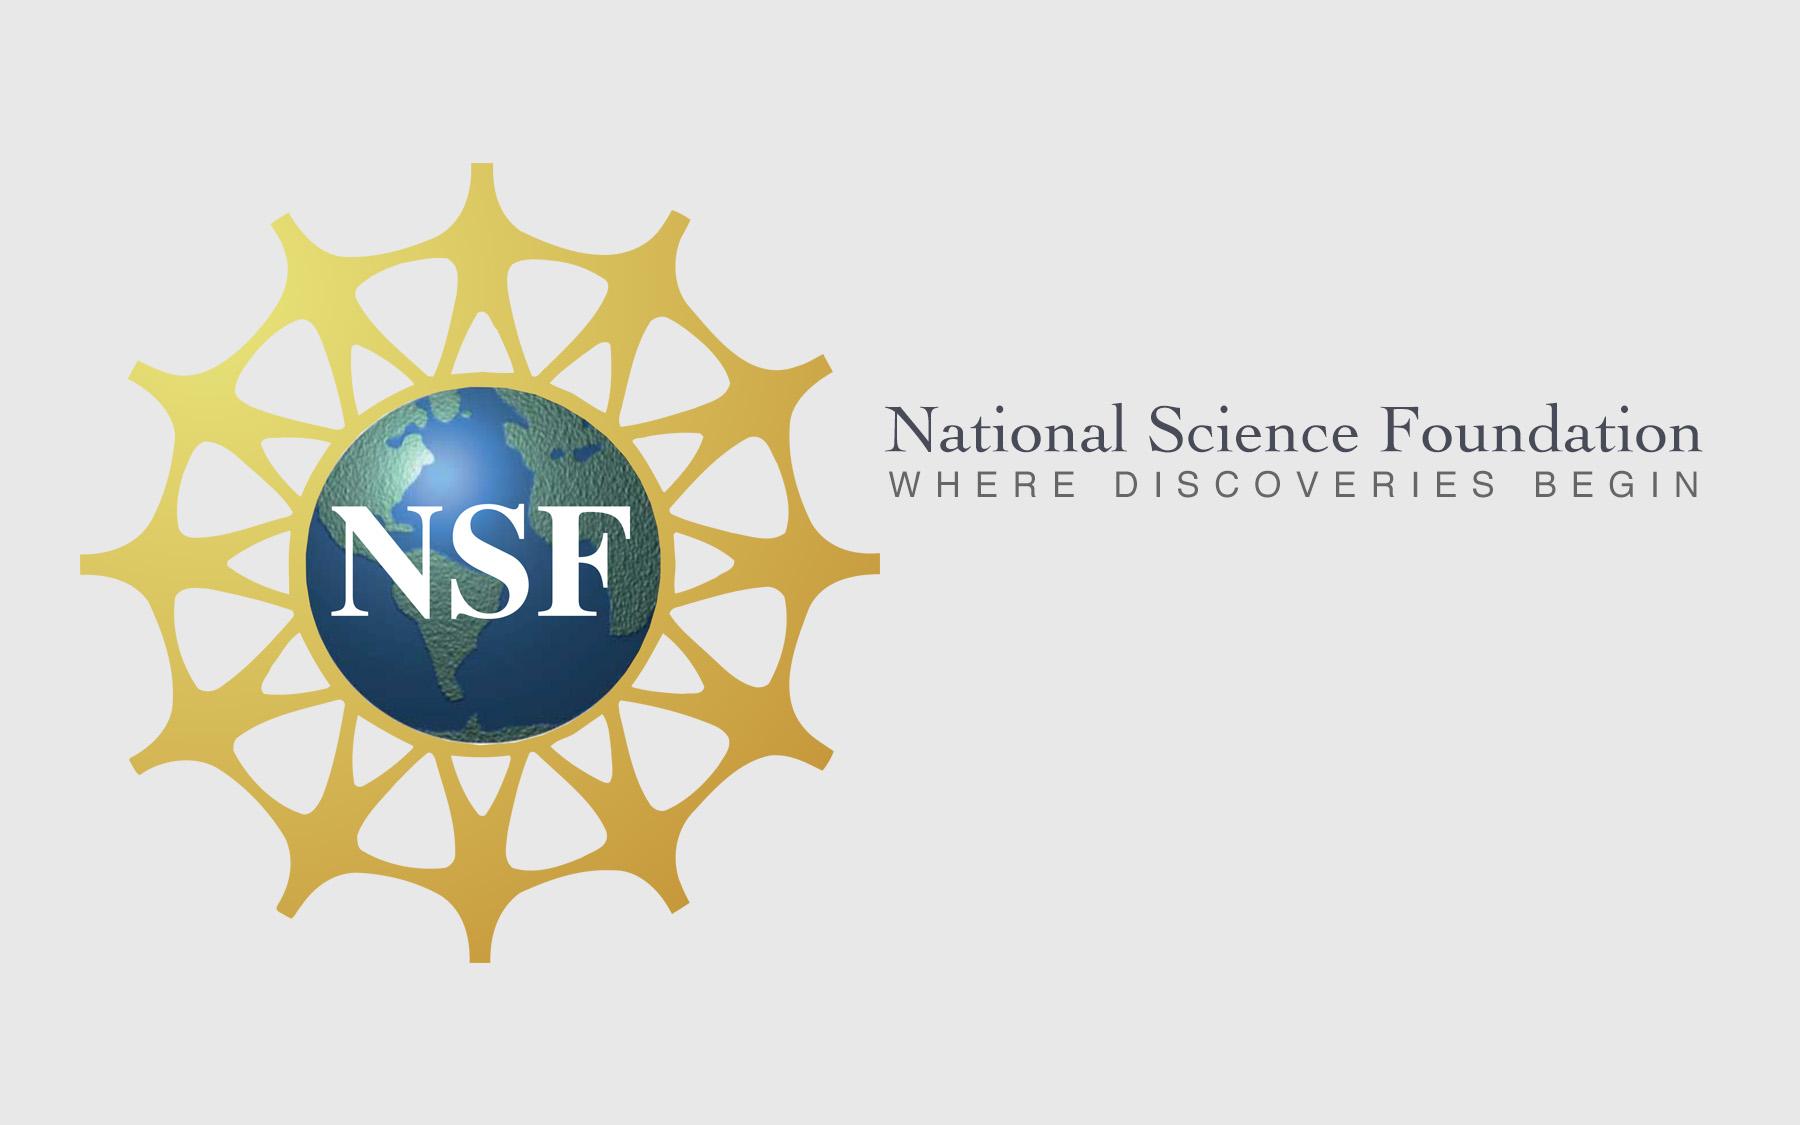 Thumbnail photo: National Science Foundation